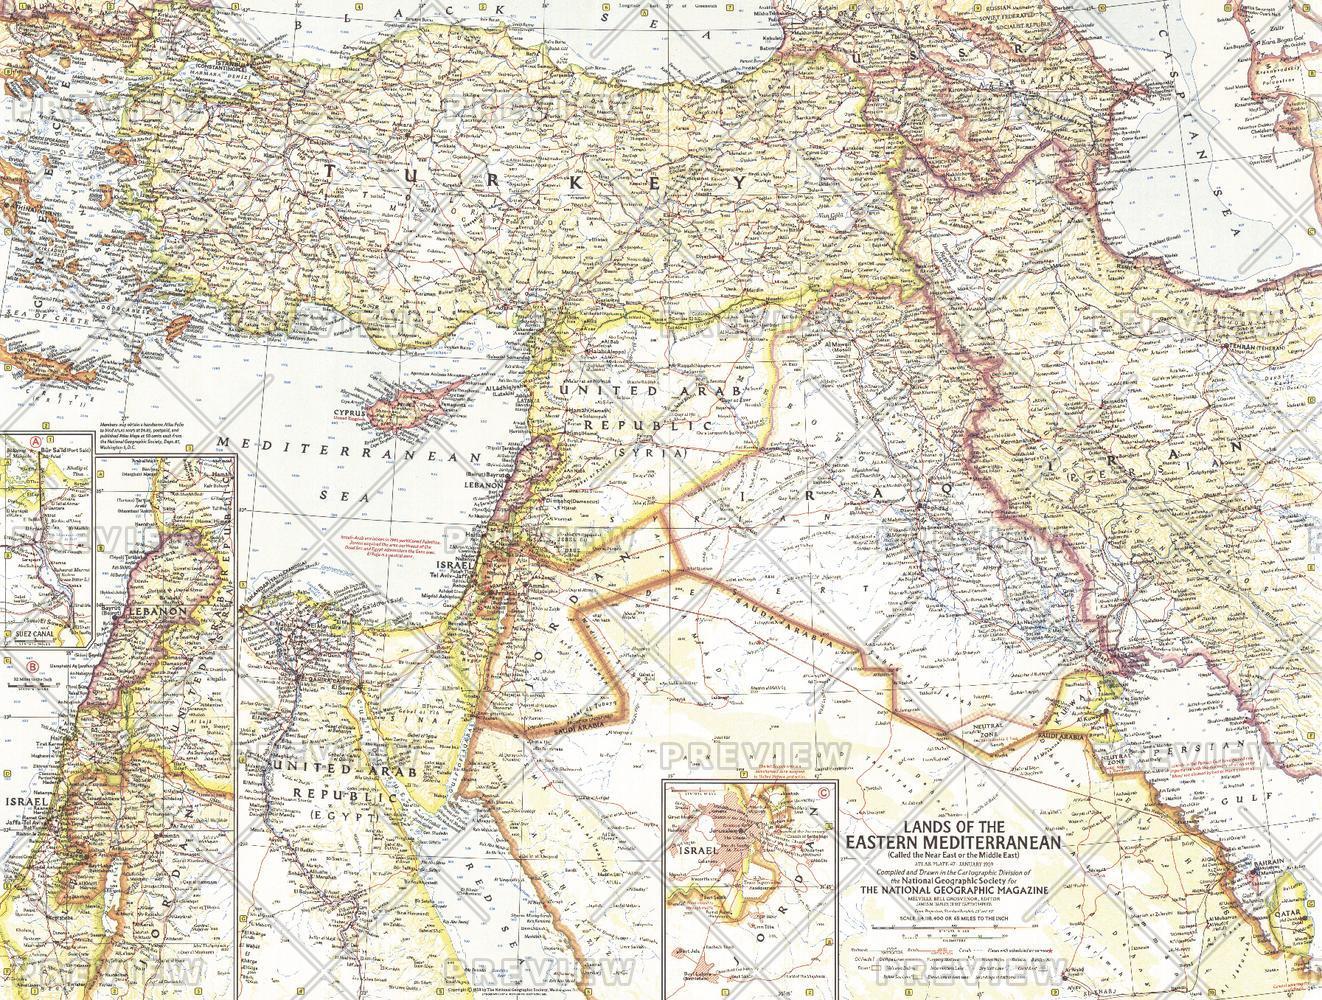 Lands of the Eastern Mediterranean  -  Published 1959